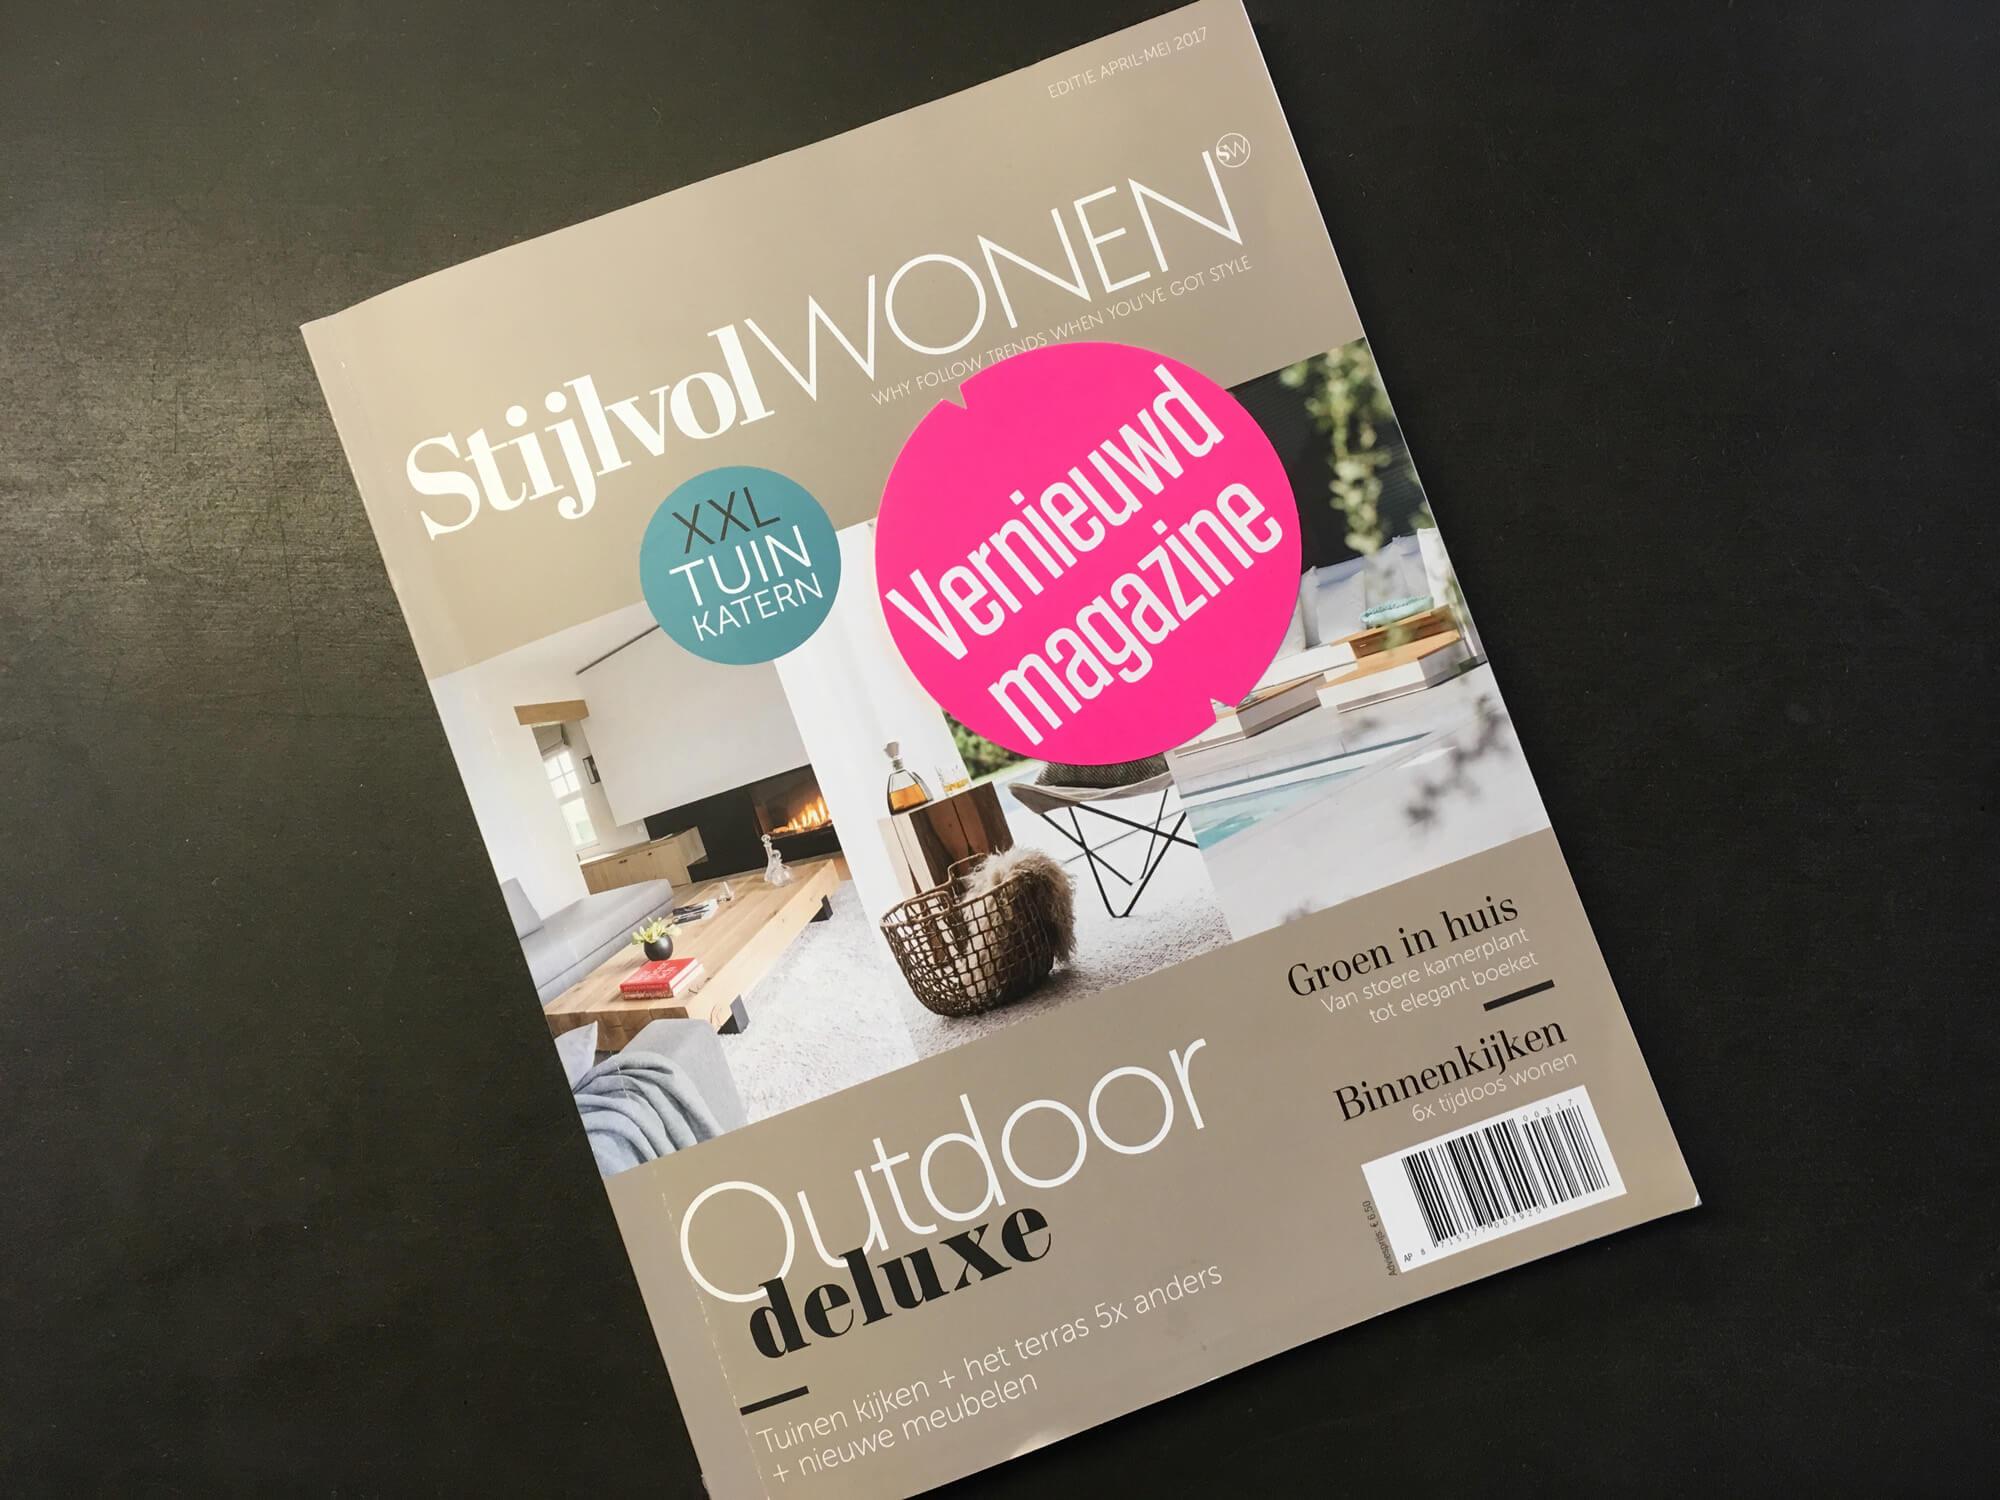 Magazine - Stijvol Wonen - Outdoor deluxe